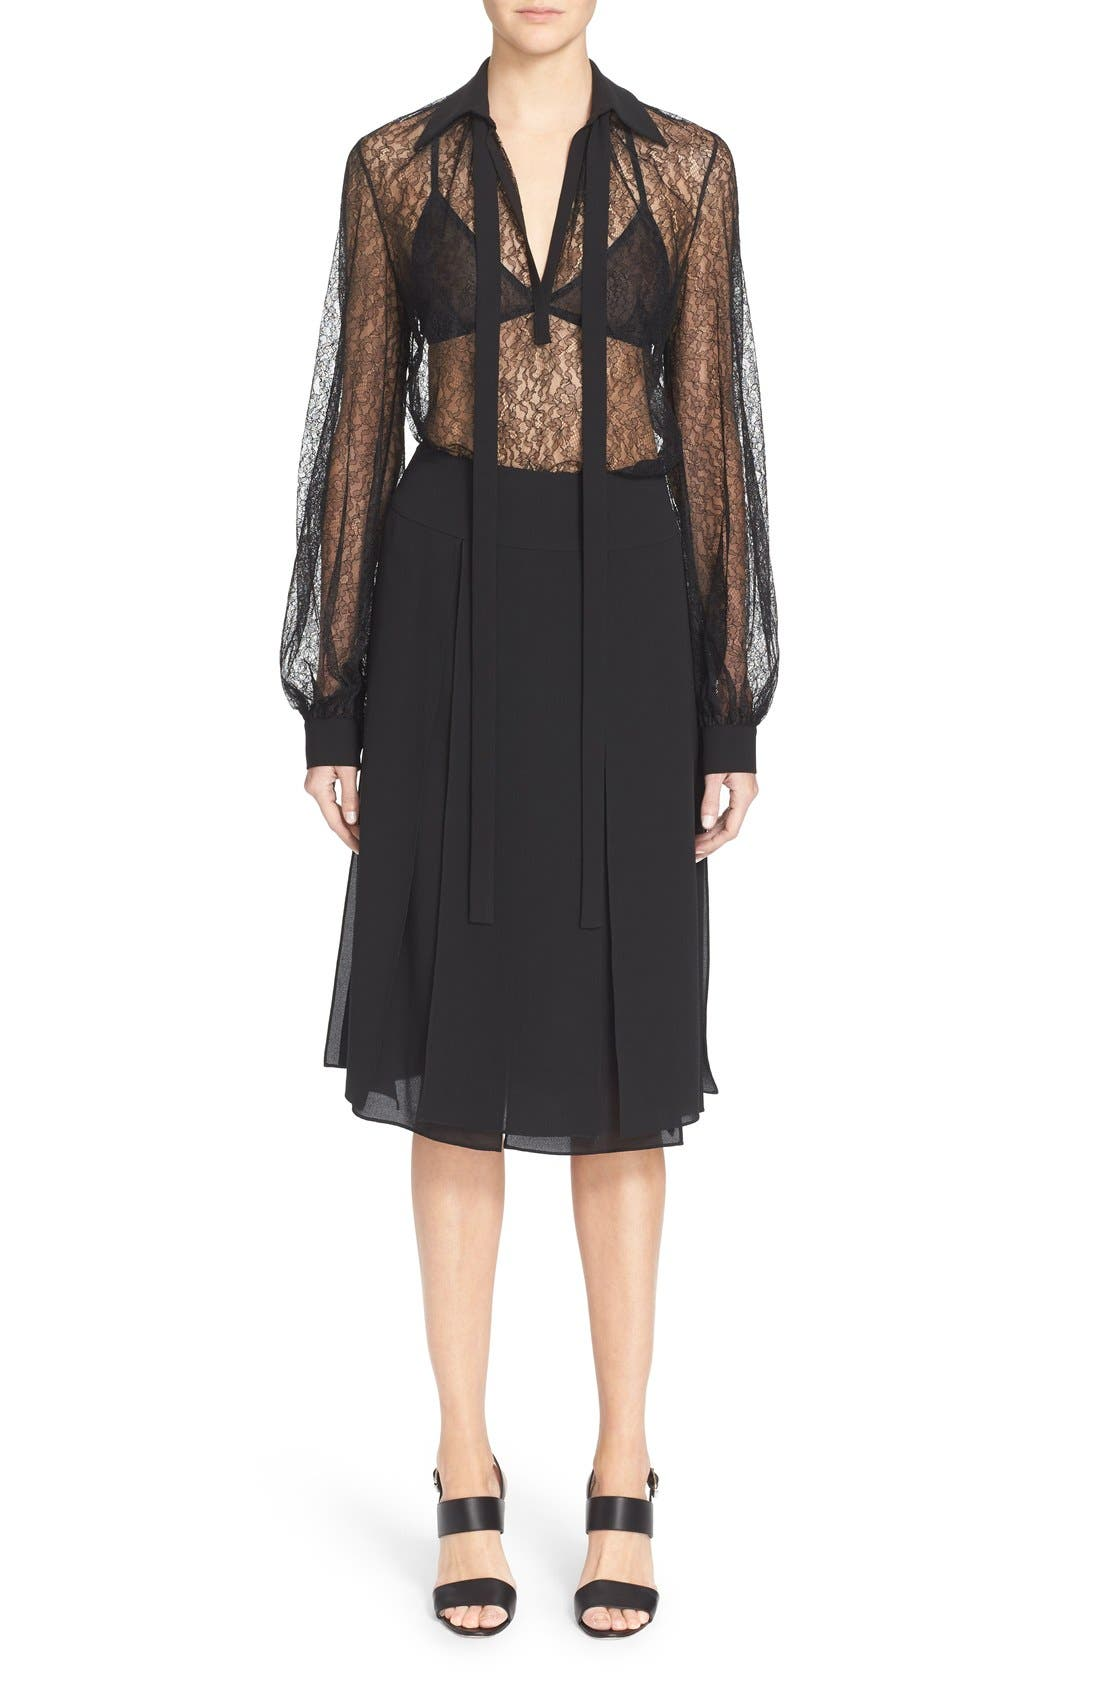 Main Image - Michael Kors Tie Neck Chantilly Lace Blouse